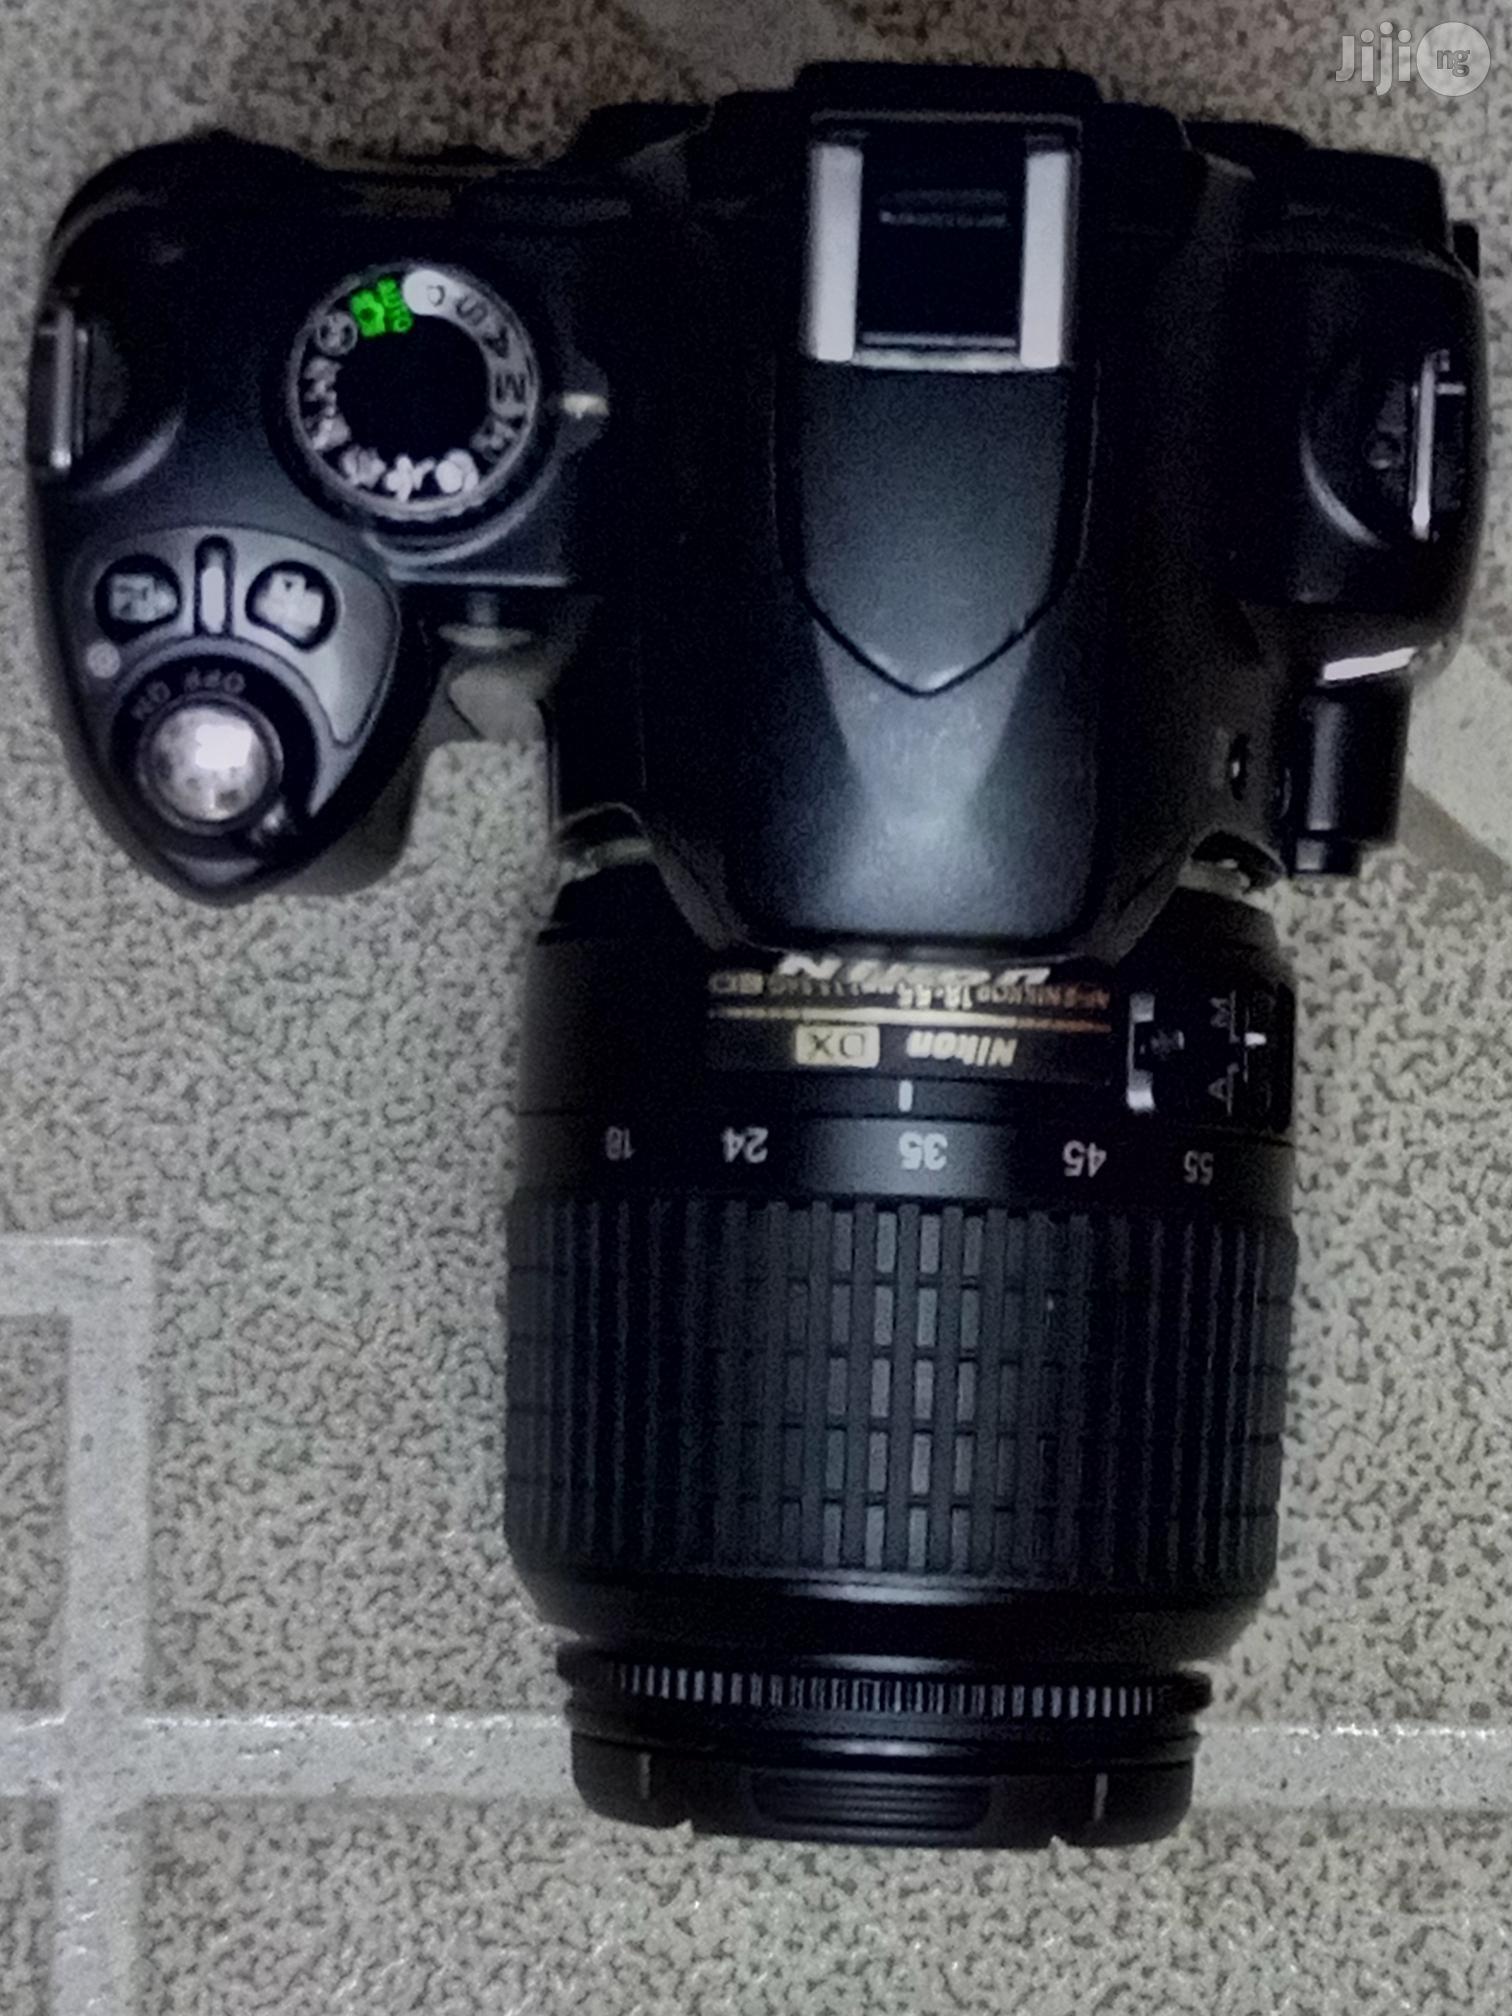 Nikon D80 Camera   Photo & Video Cameras for sale in Lagos Island (Eko), Lagos State, Nigeria